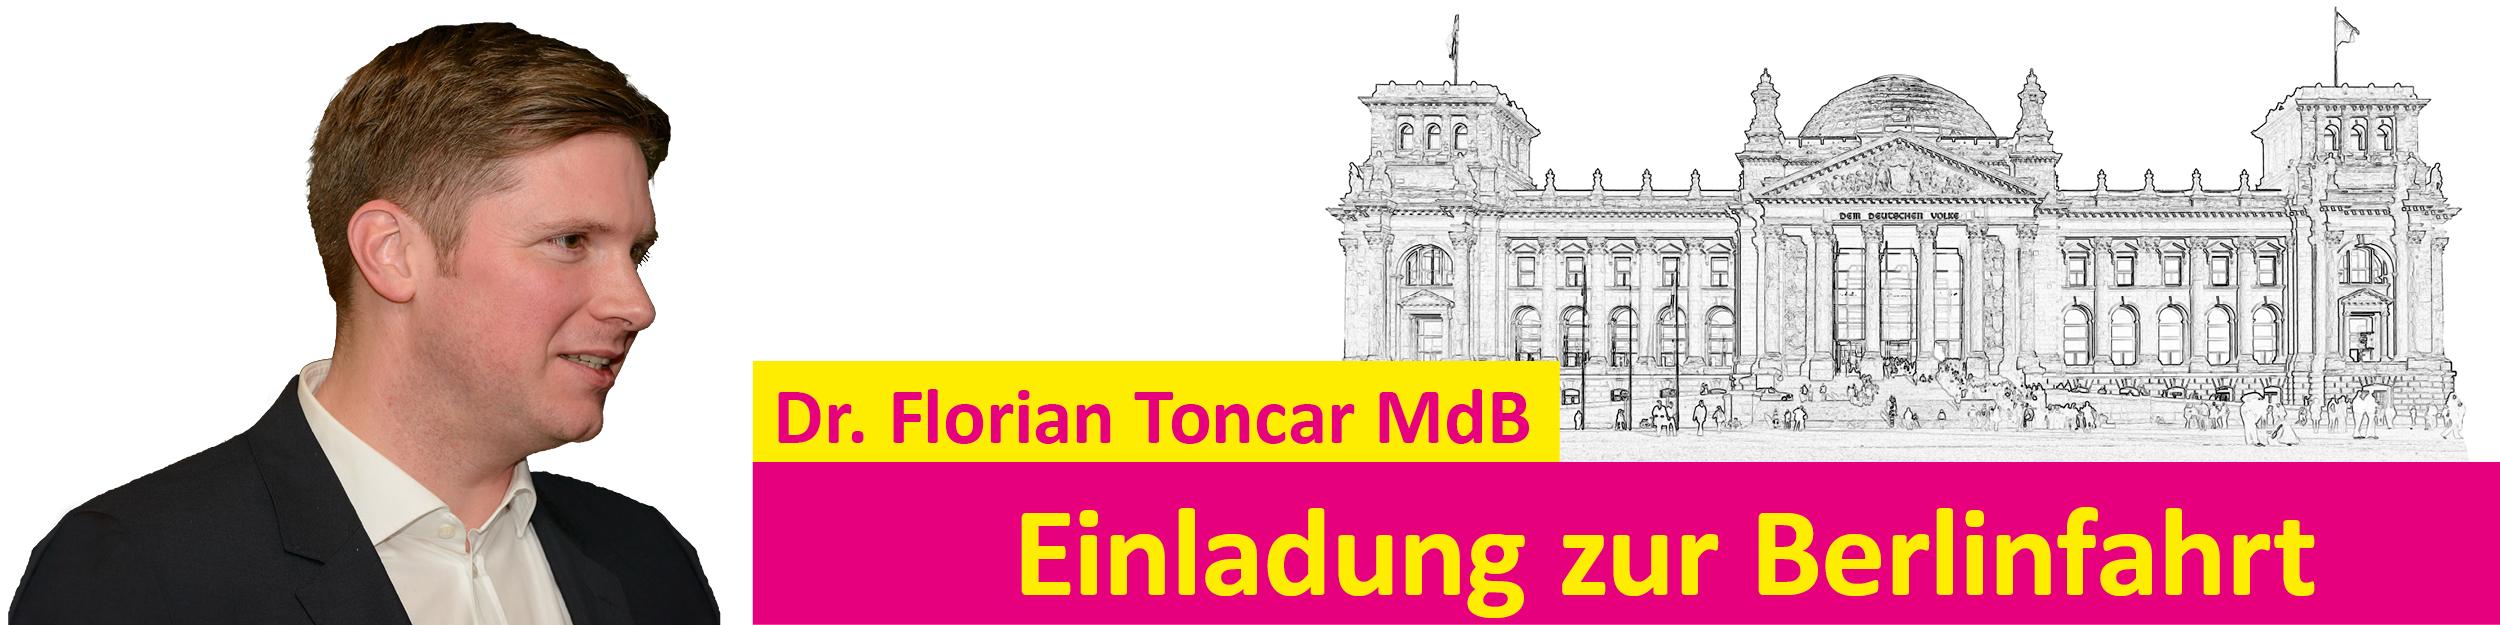 Der Kreisverband Ludwigsburg der FDP - Dr. Florian Toncar MdB ...